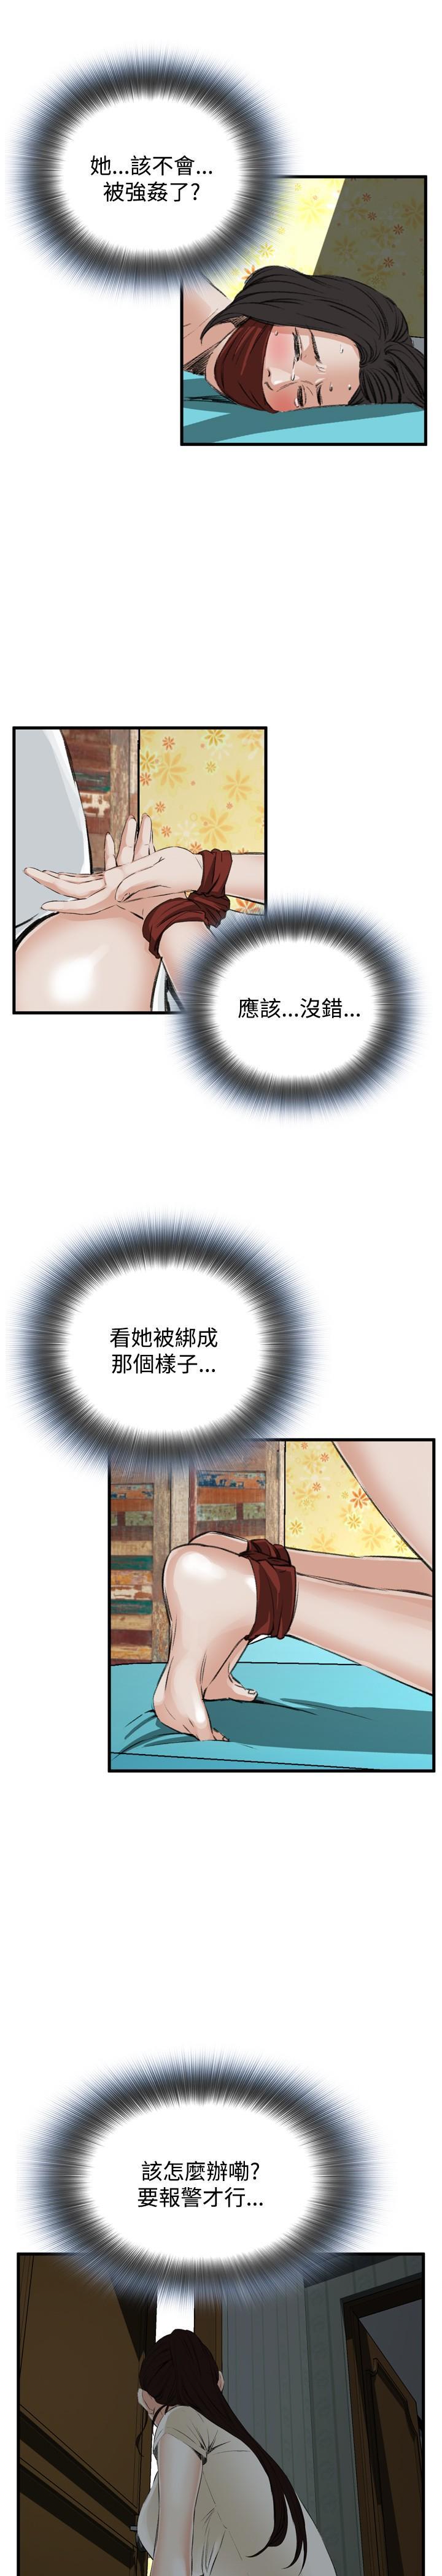 Take a Peek 偷窥 Ch.39~60 [Chinese]中文 163